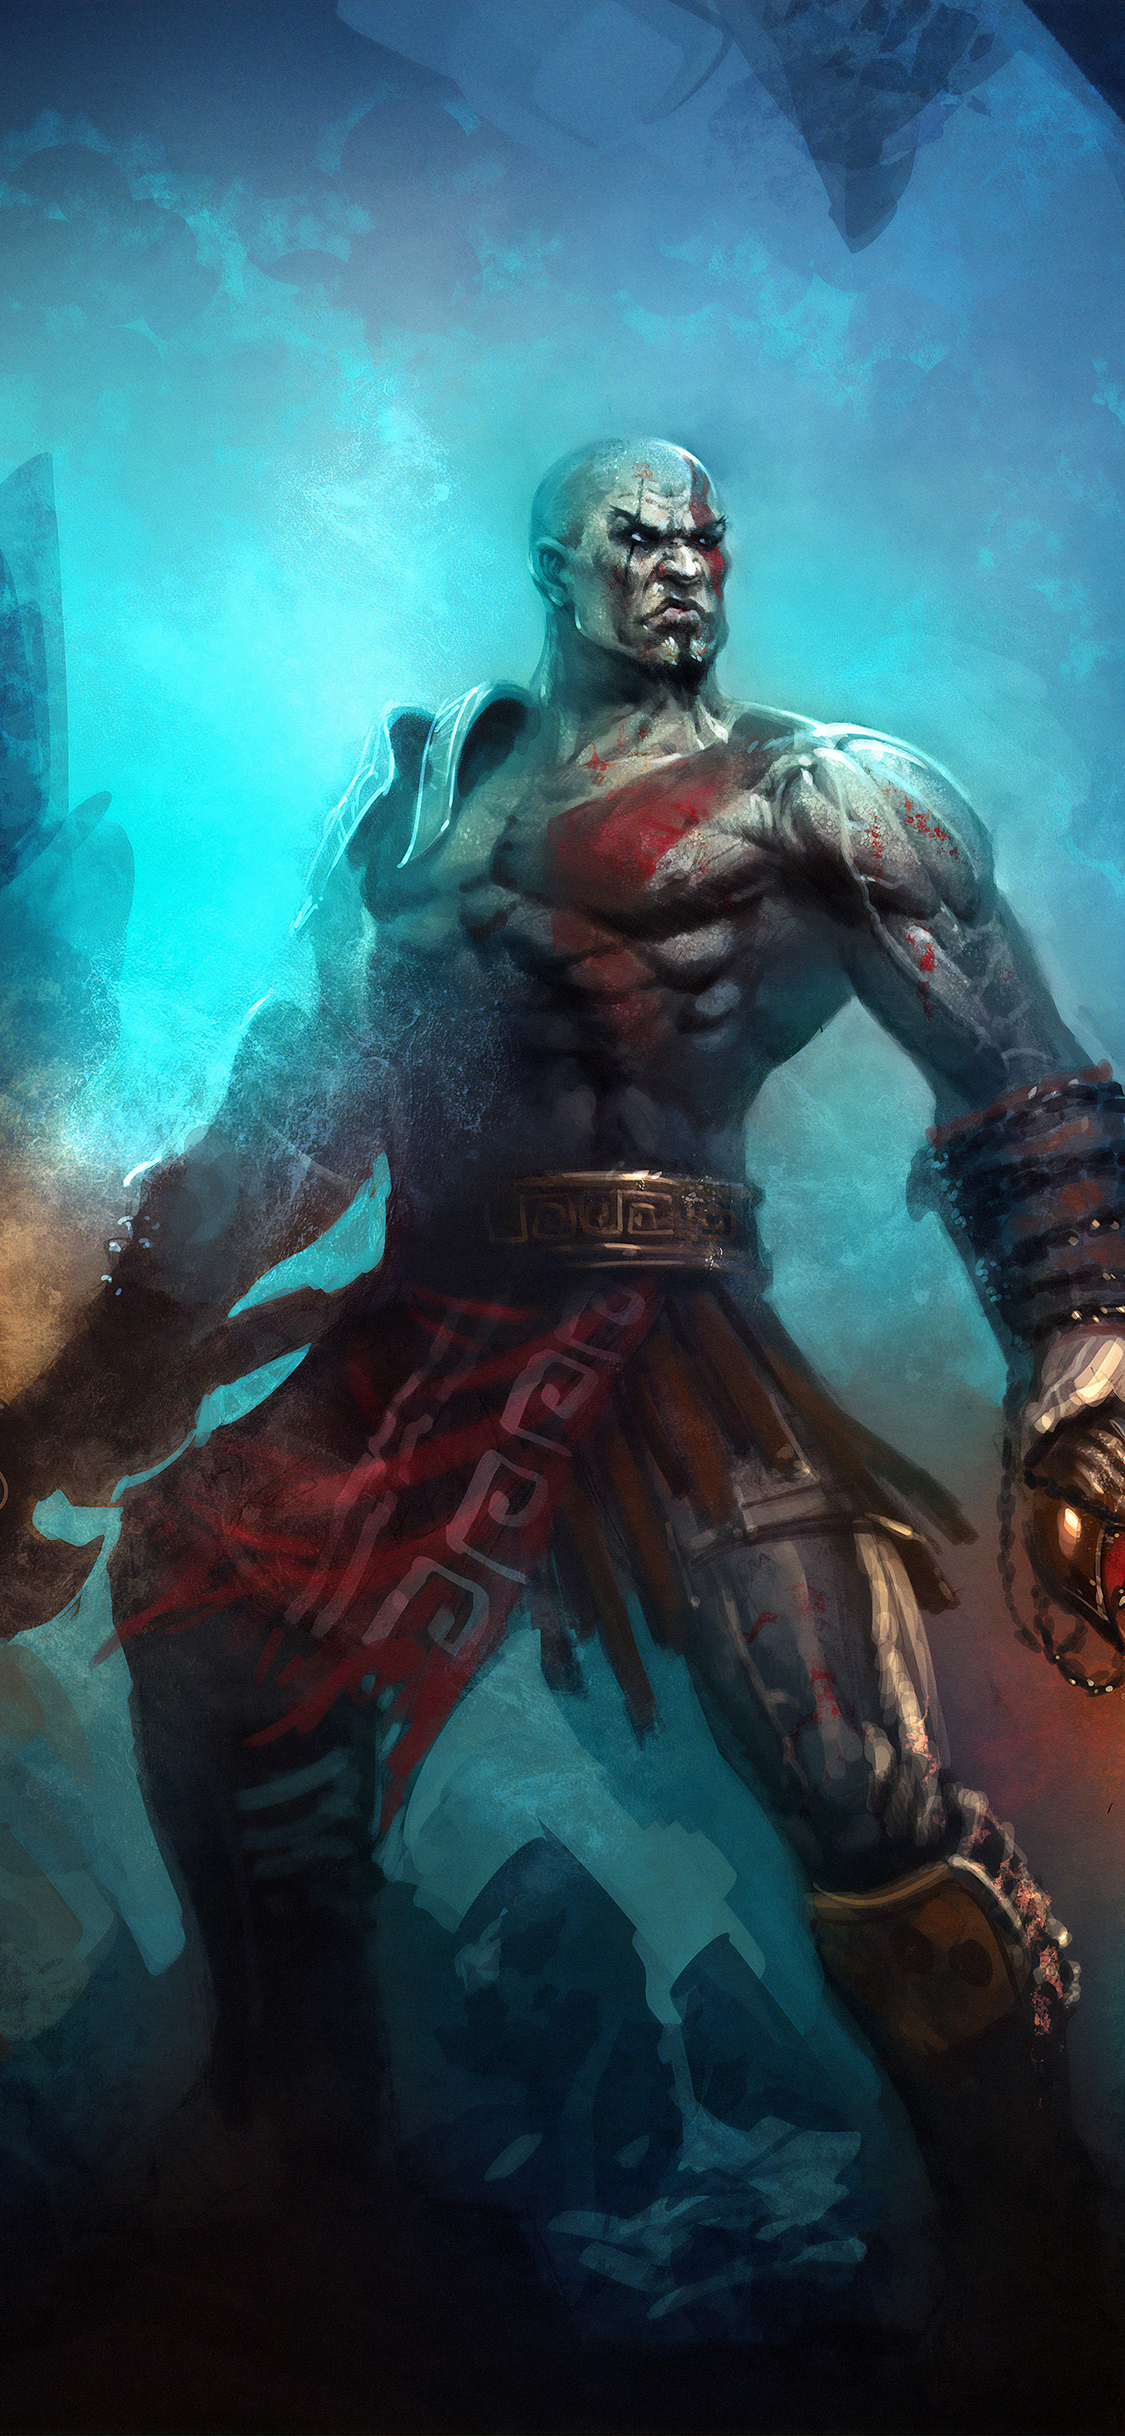 kratos-artwork-4k-10.jpg